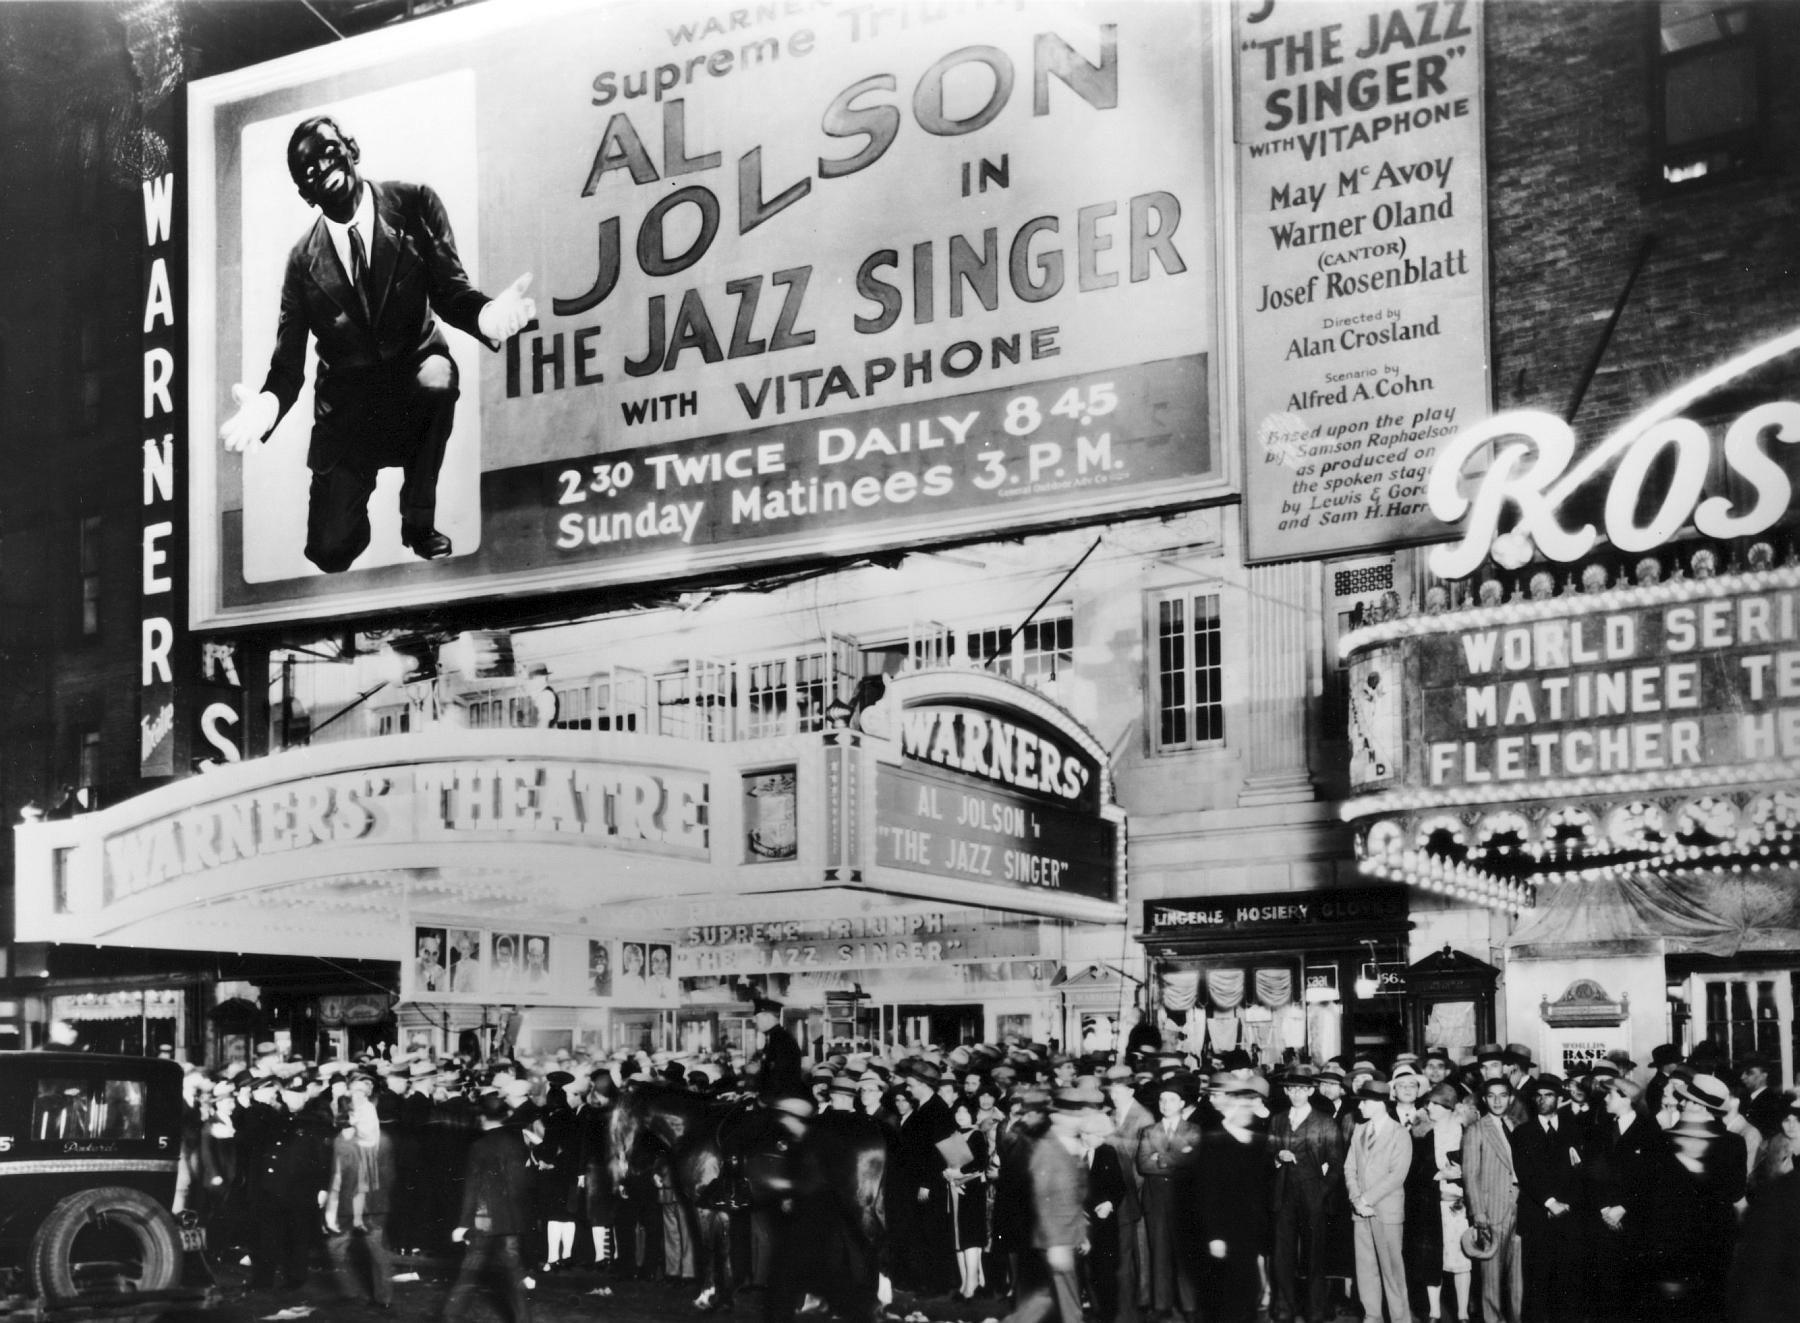 """Prima newyorkese di The Jazz Singer: 6 ottobre 1927."""